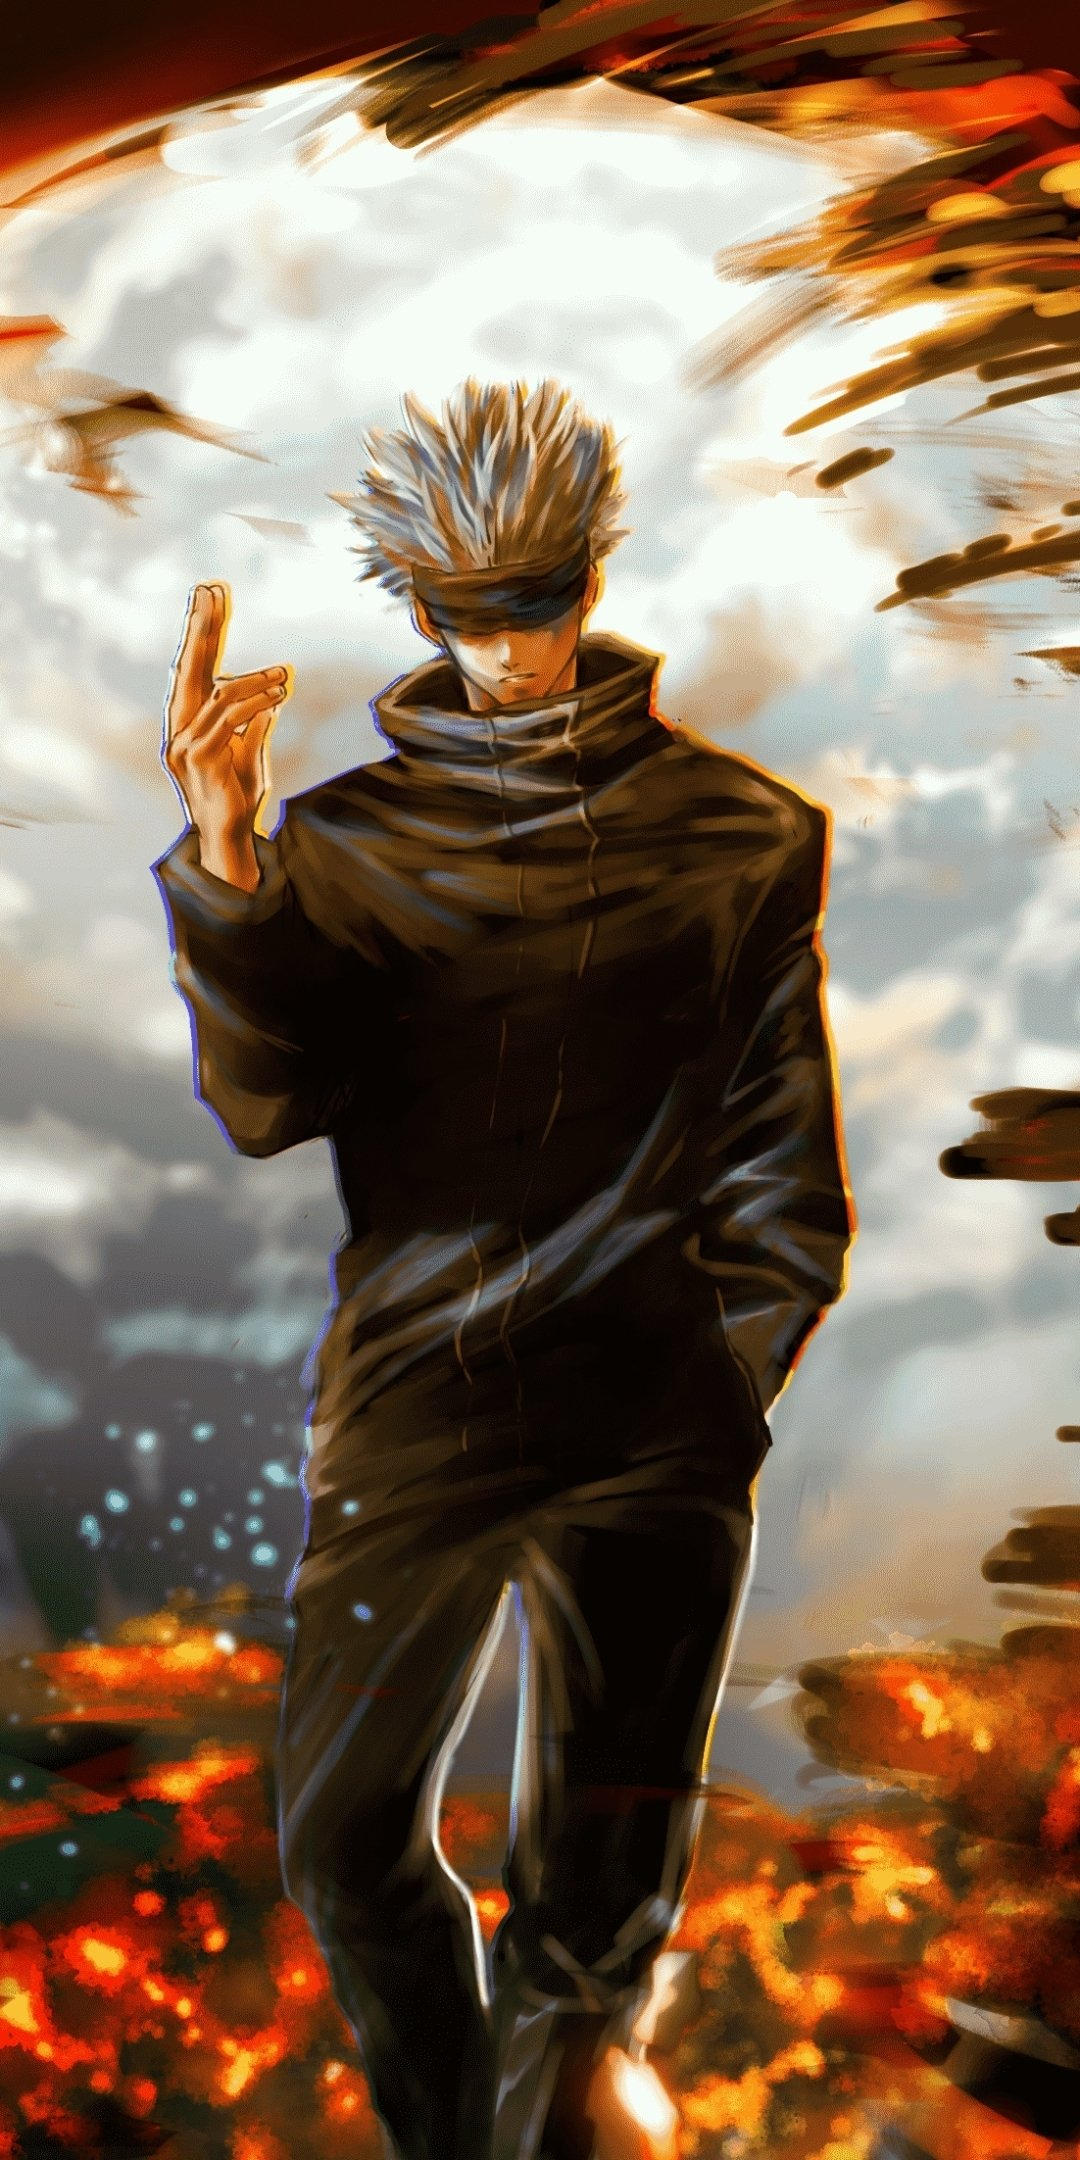 Anime / Jujutsu Kaisen (1080x2160) Mobile Wallpaper